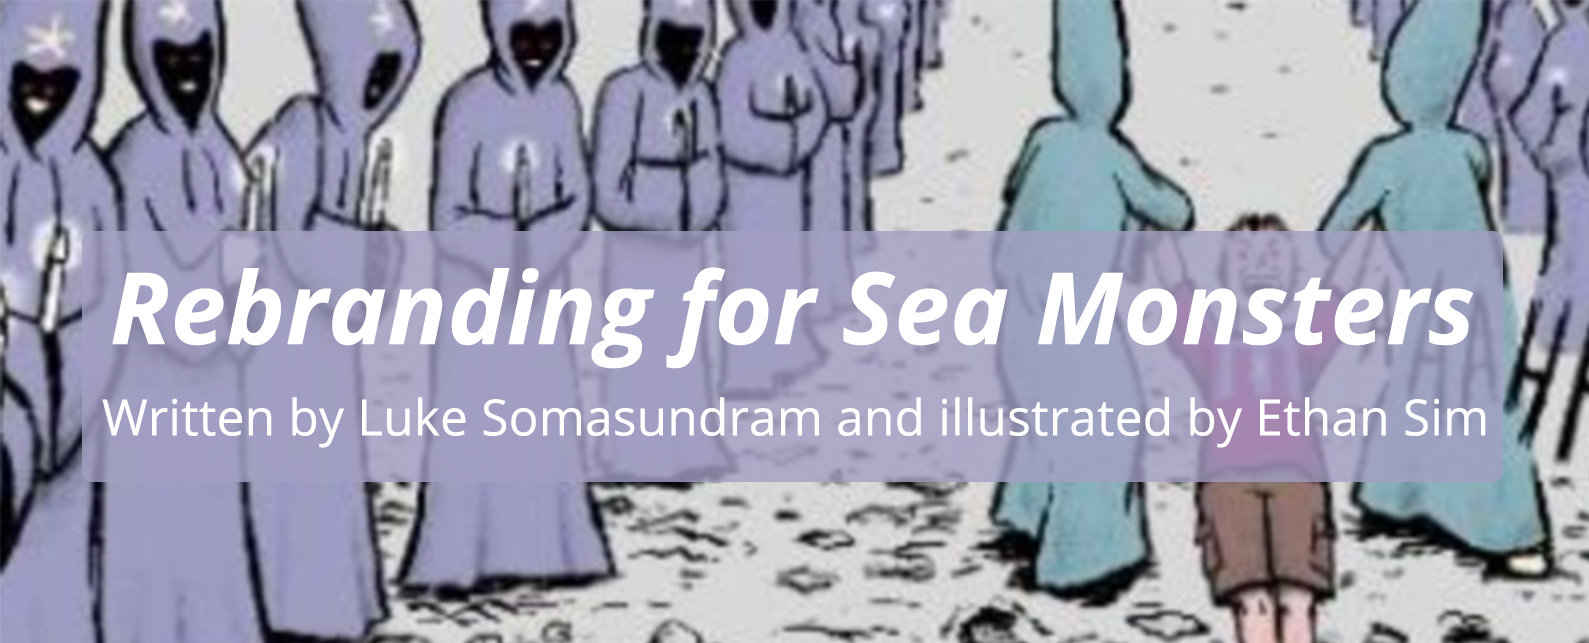 Rebranding for Sea Monsters written by Luke Somasundram and illustrated by Ethan Sim